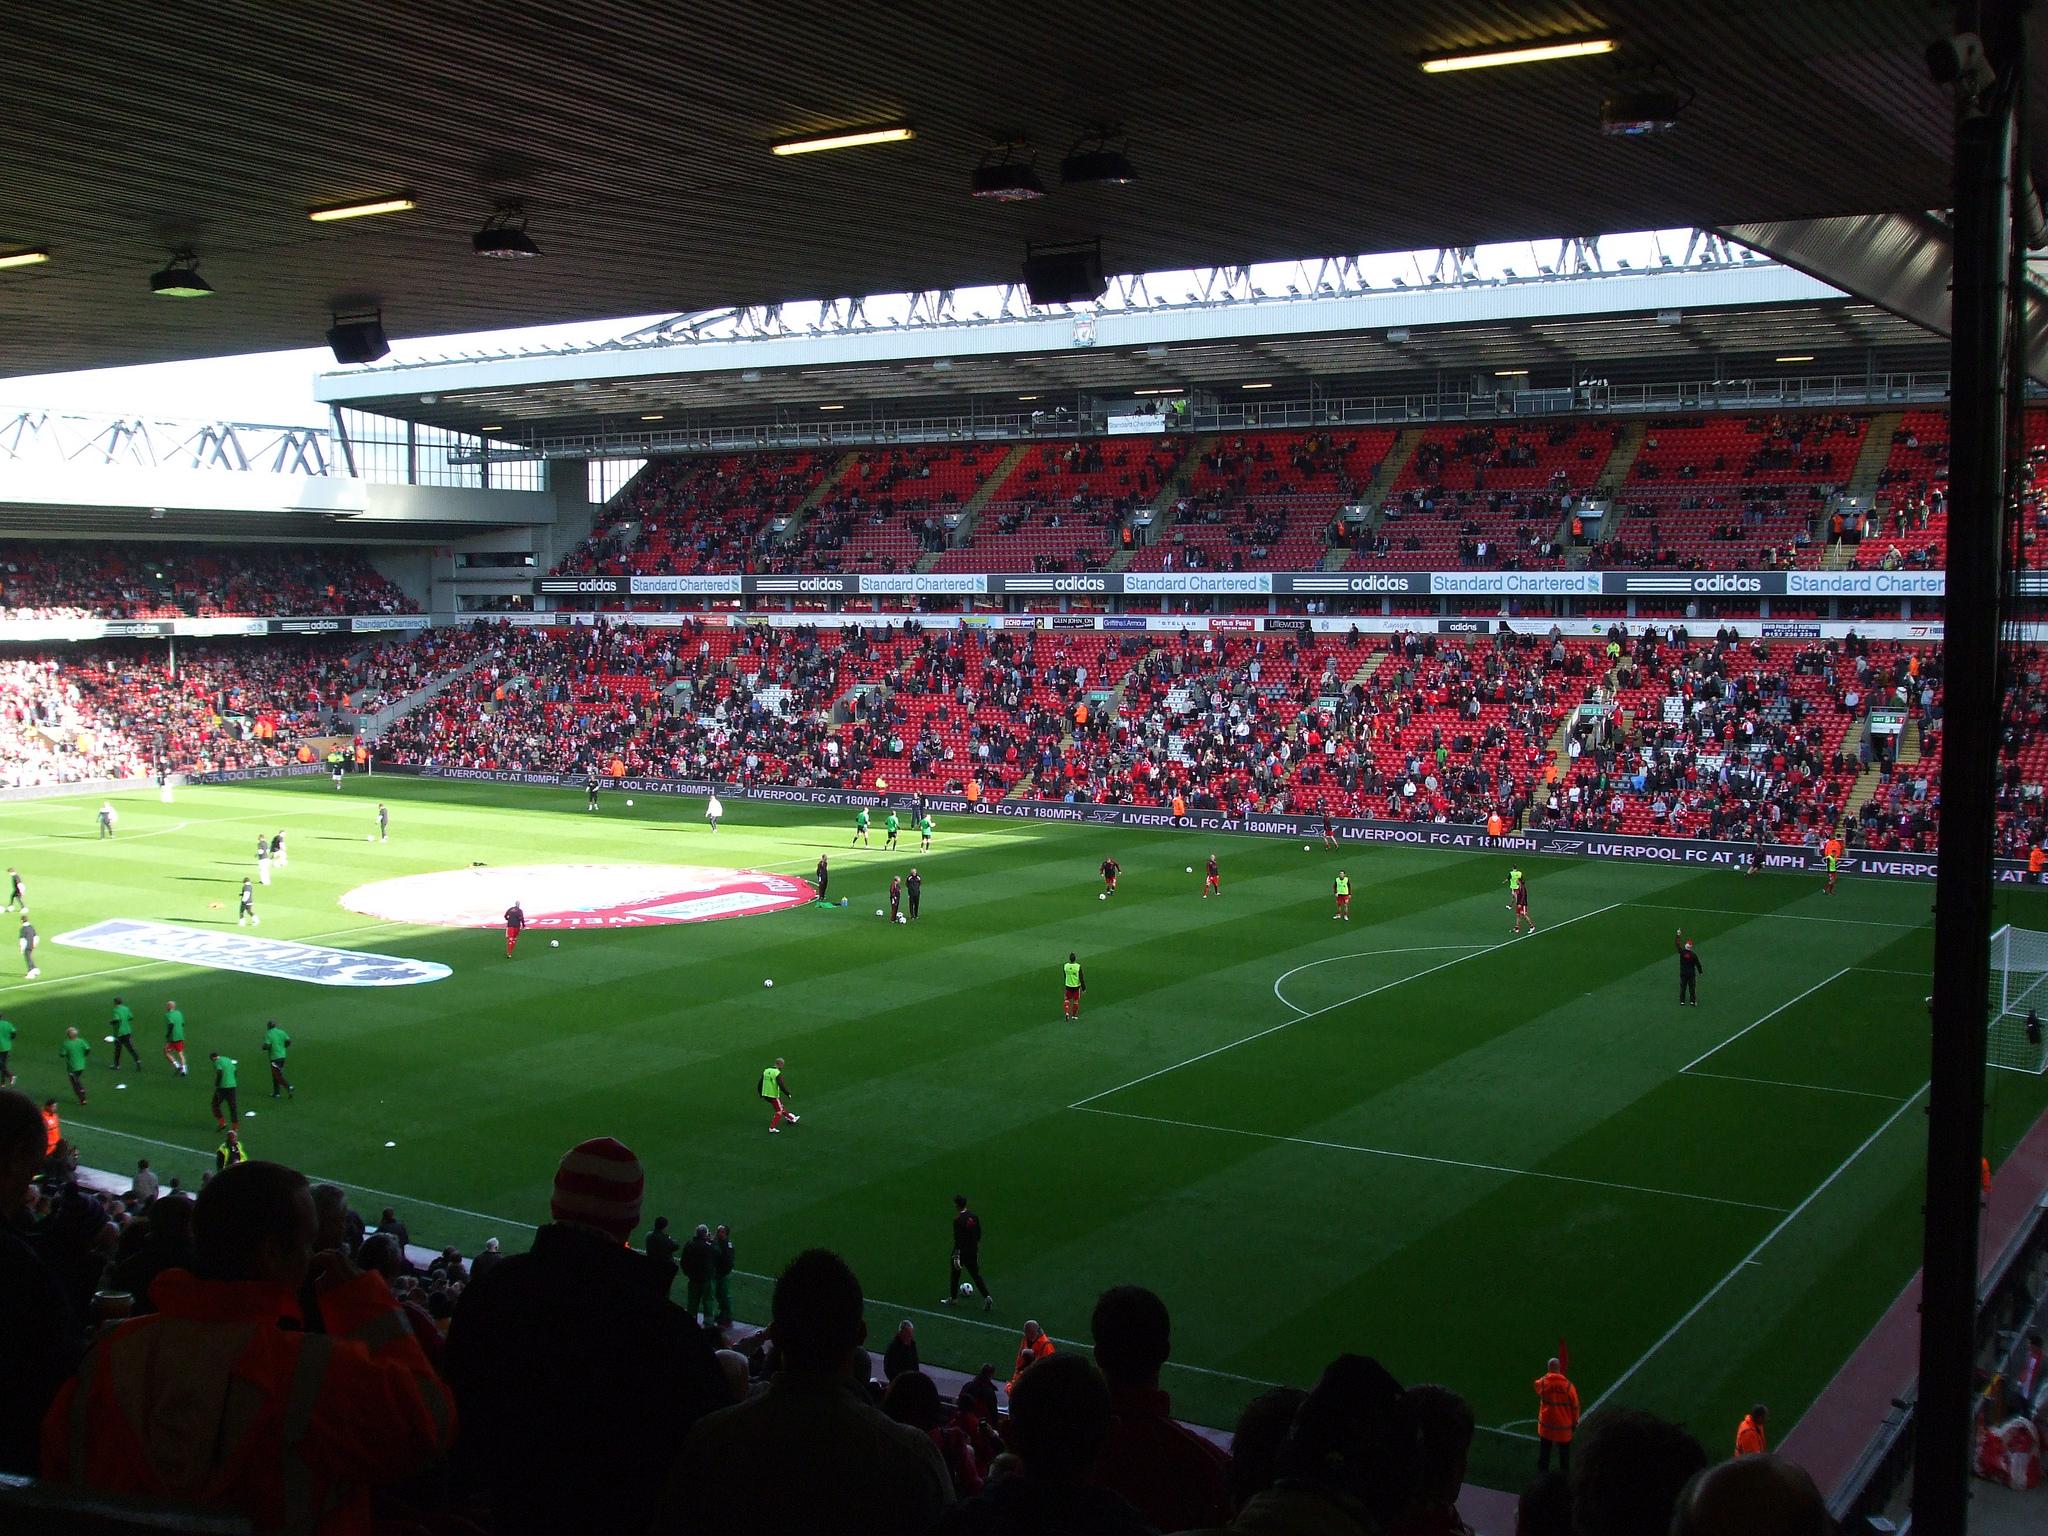 Pedestal Fans Blocking : File anfield stadium january g wikimedia commons